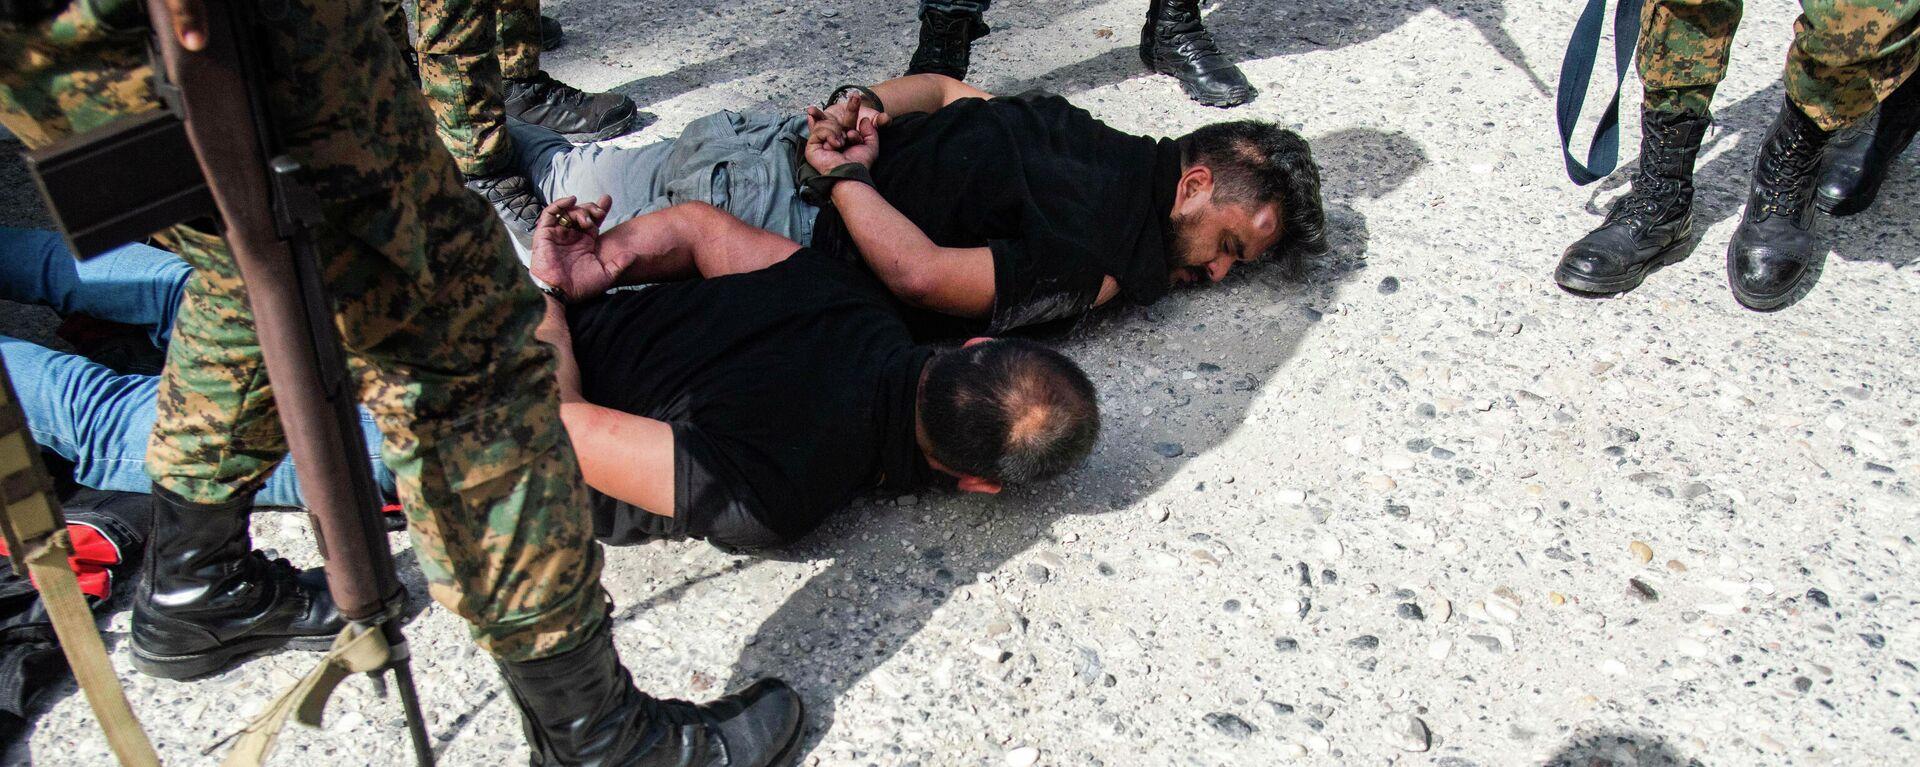 Los detenidos cómplices del asesinato del presidente haitiano, Jovenel Moise - Sputnik Mundo, 1920, 15.07.2021